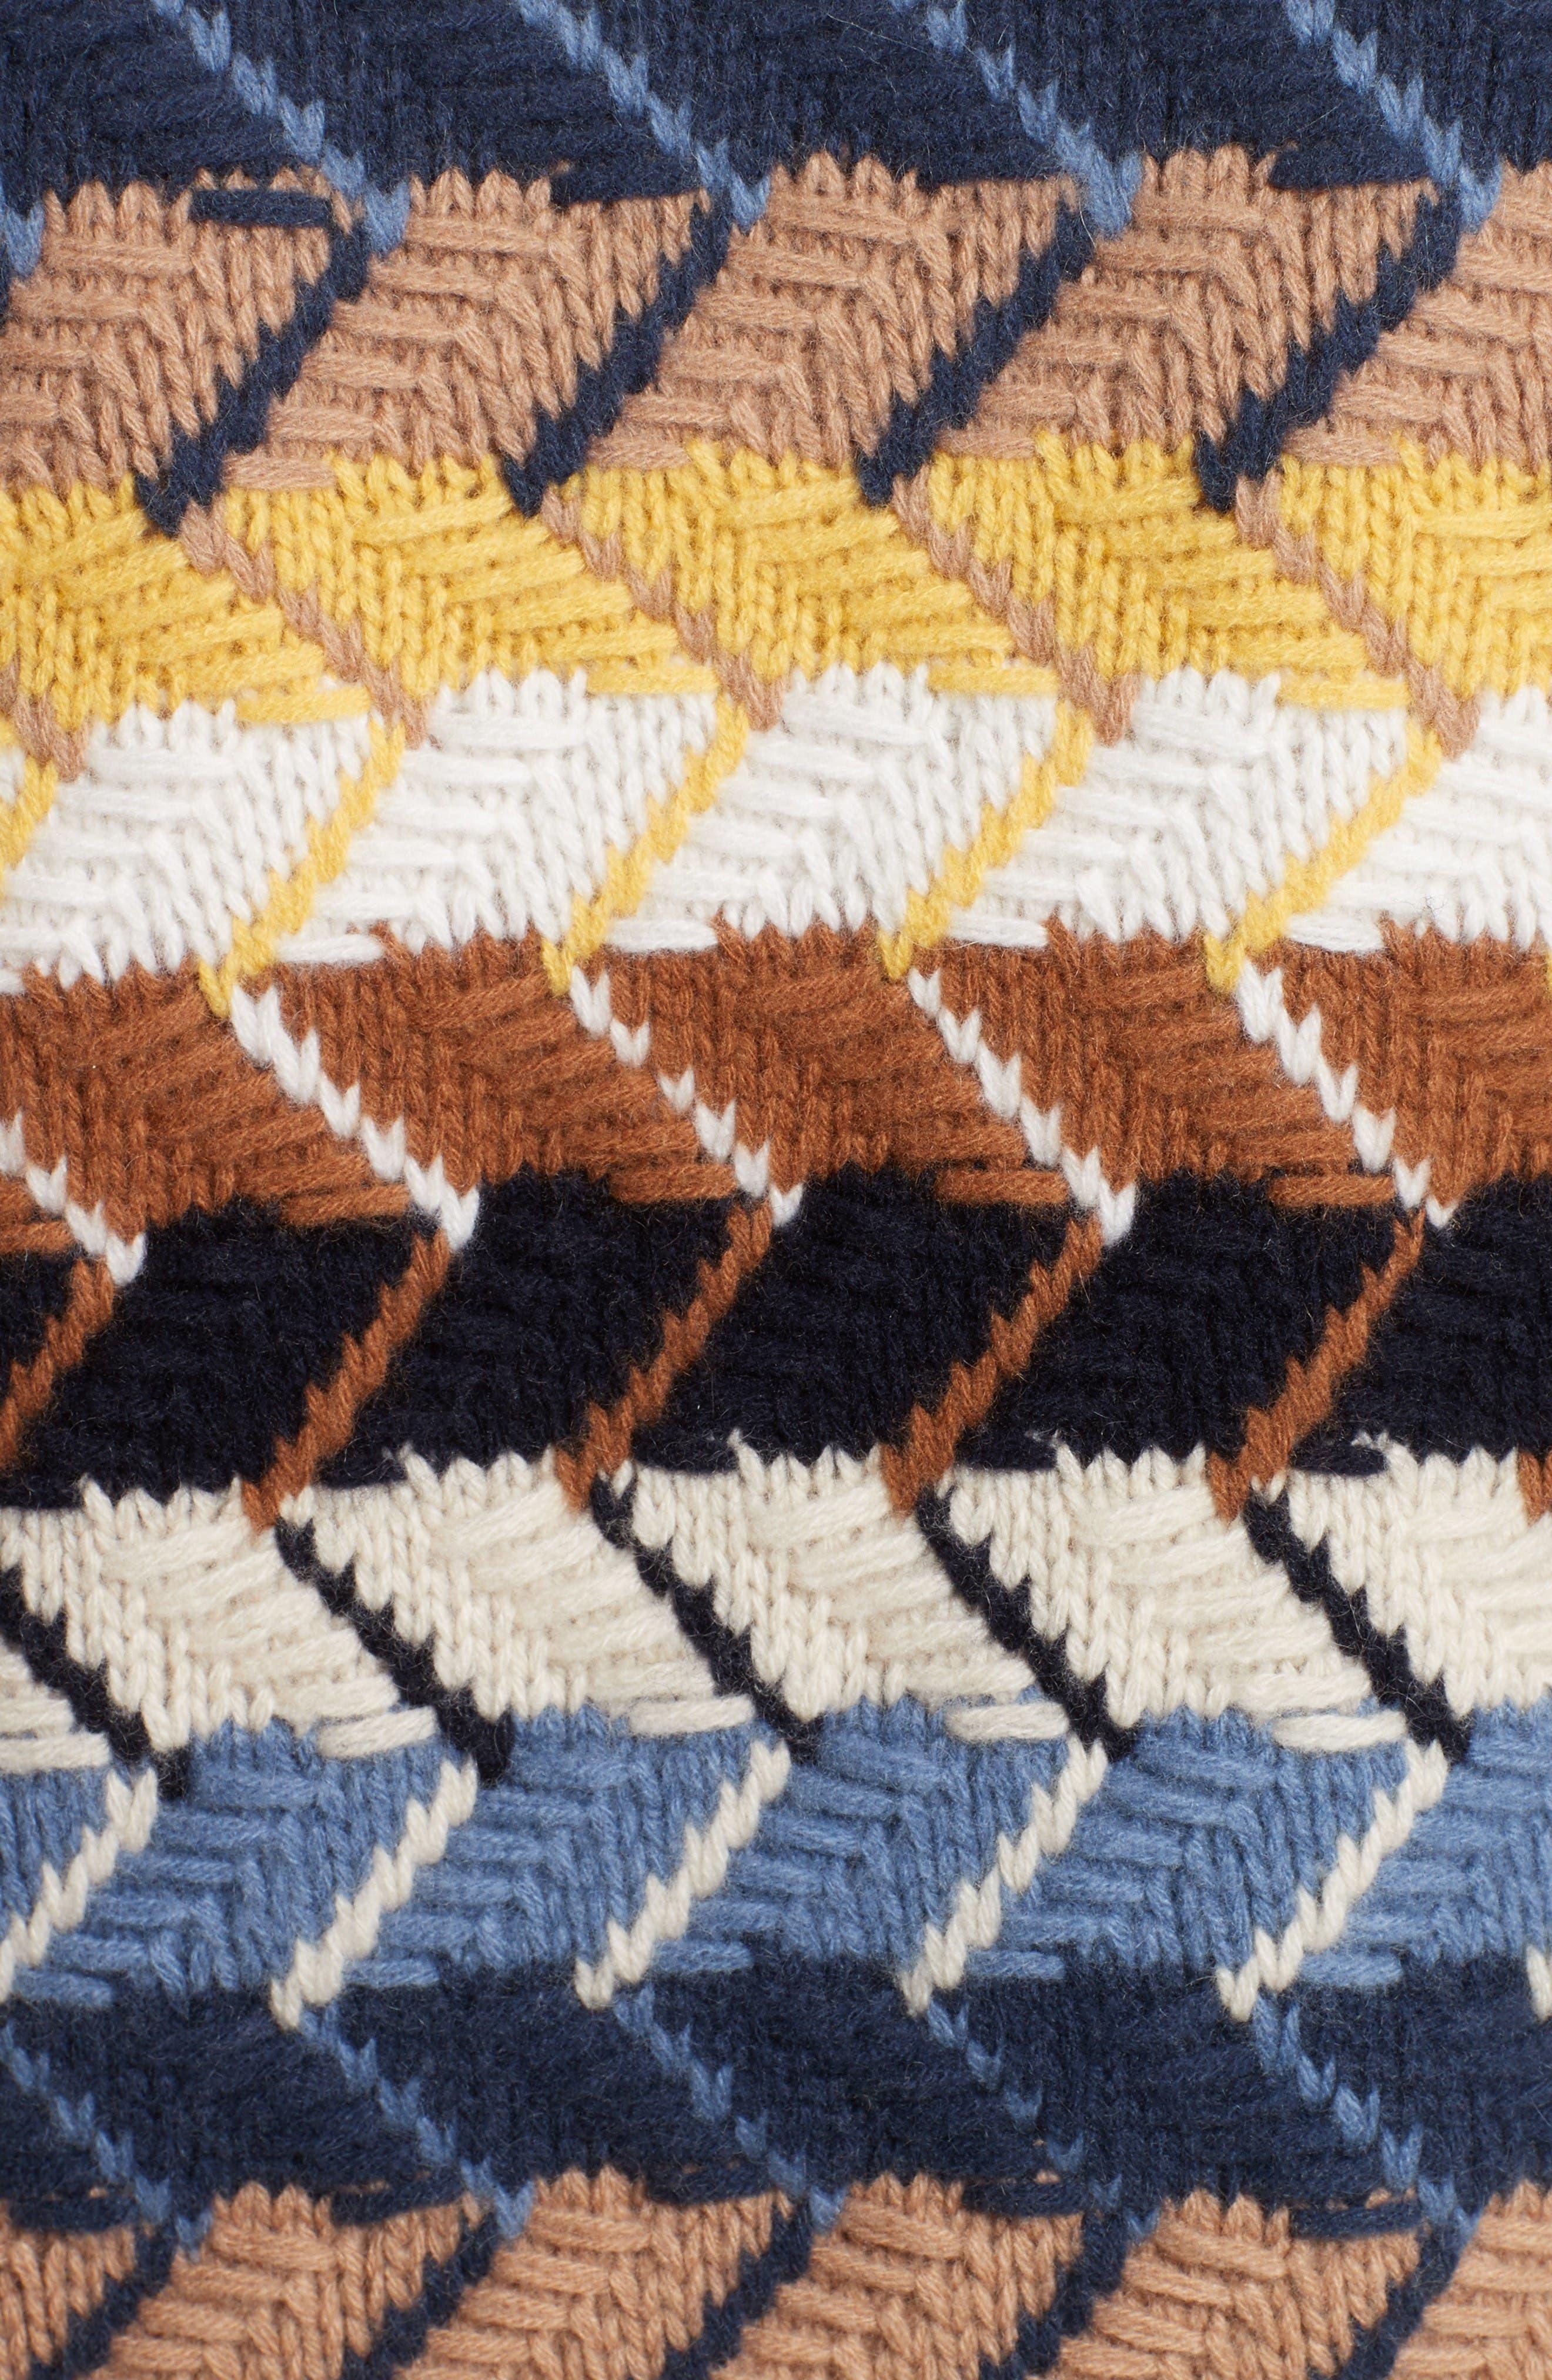 Herringbone Wool & Cashmere Turtleneck Sweater,                             Alternate thumbnail 3, color,                             Multicolor Blue